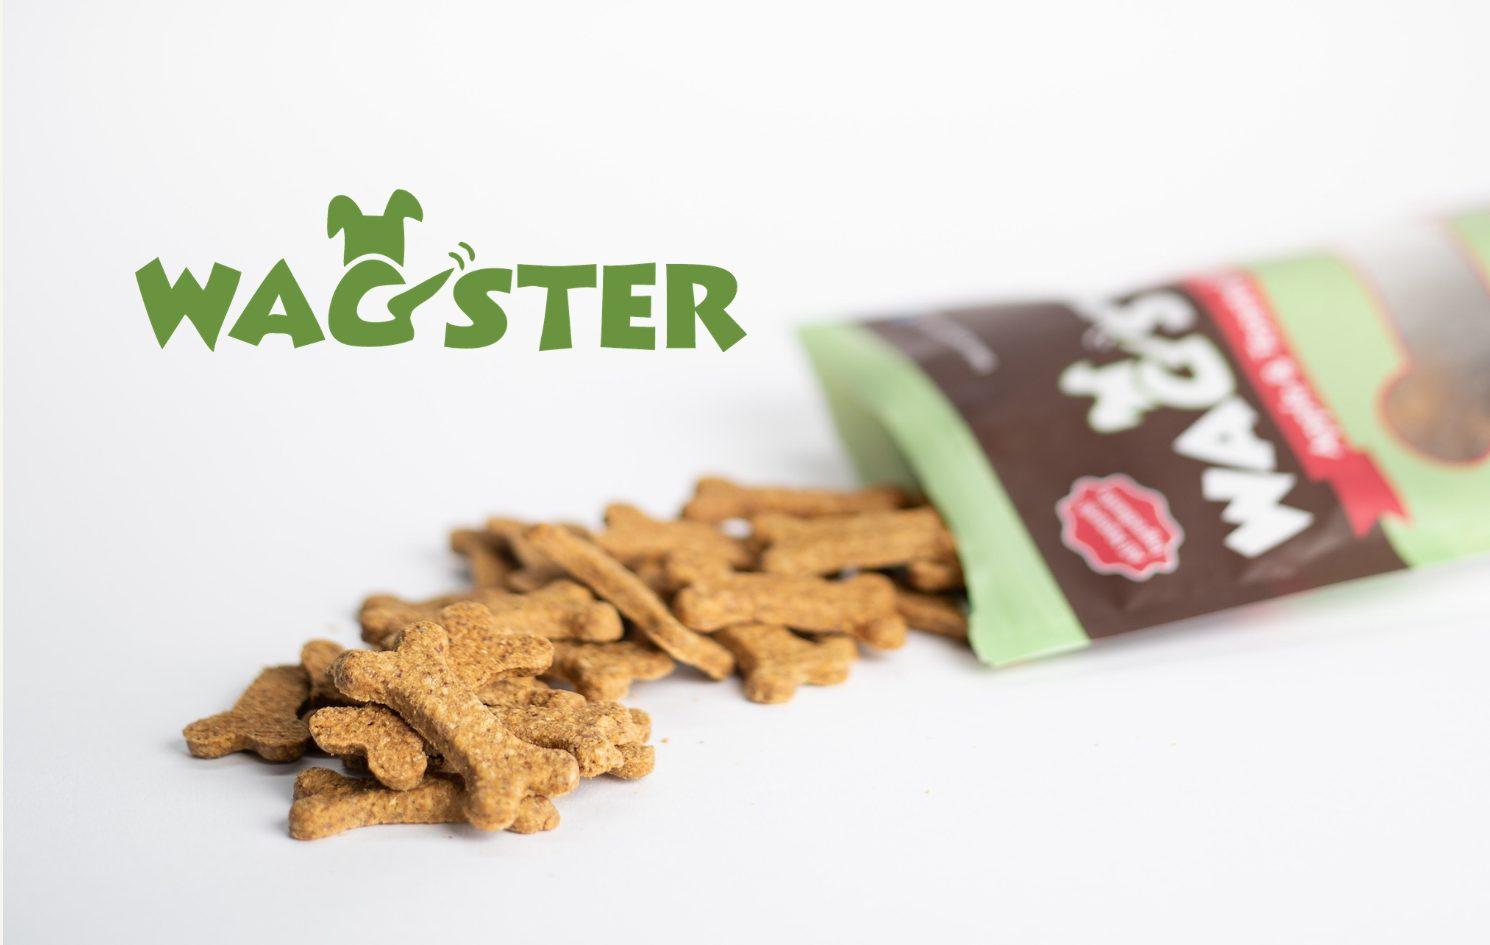 Wagster Dog Treats